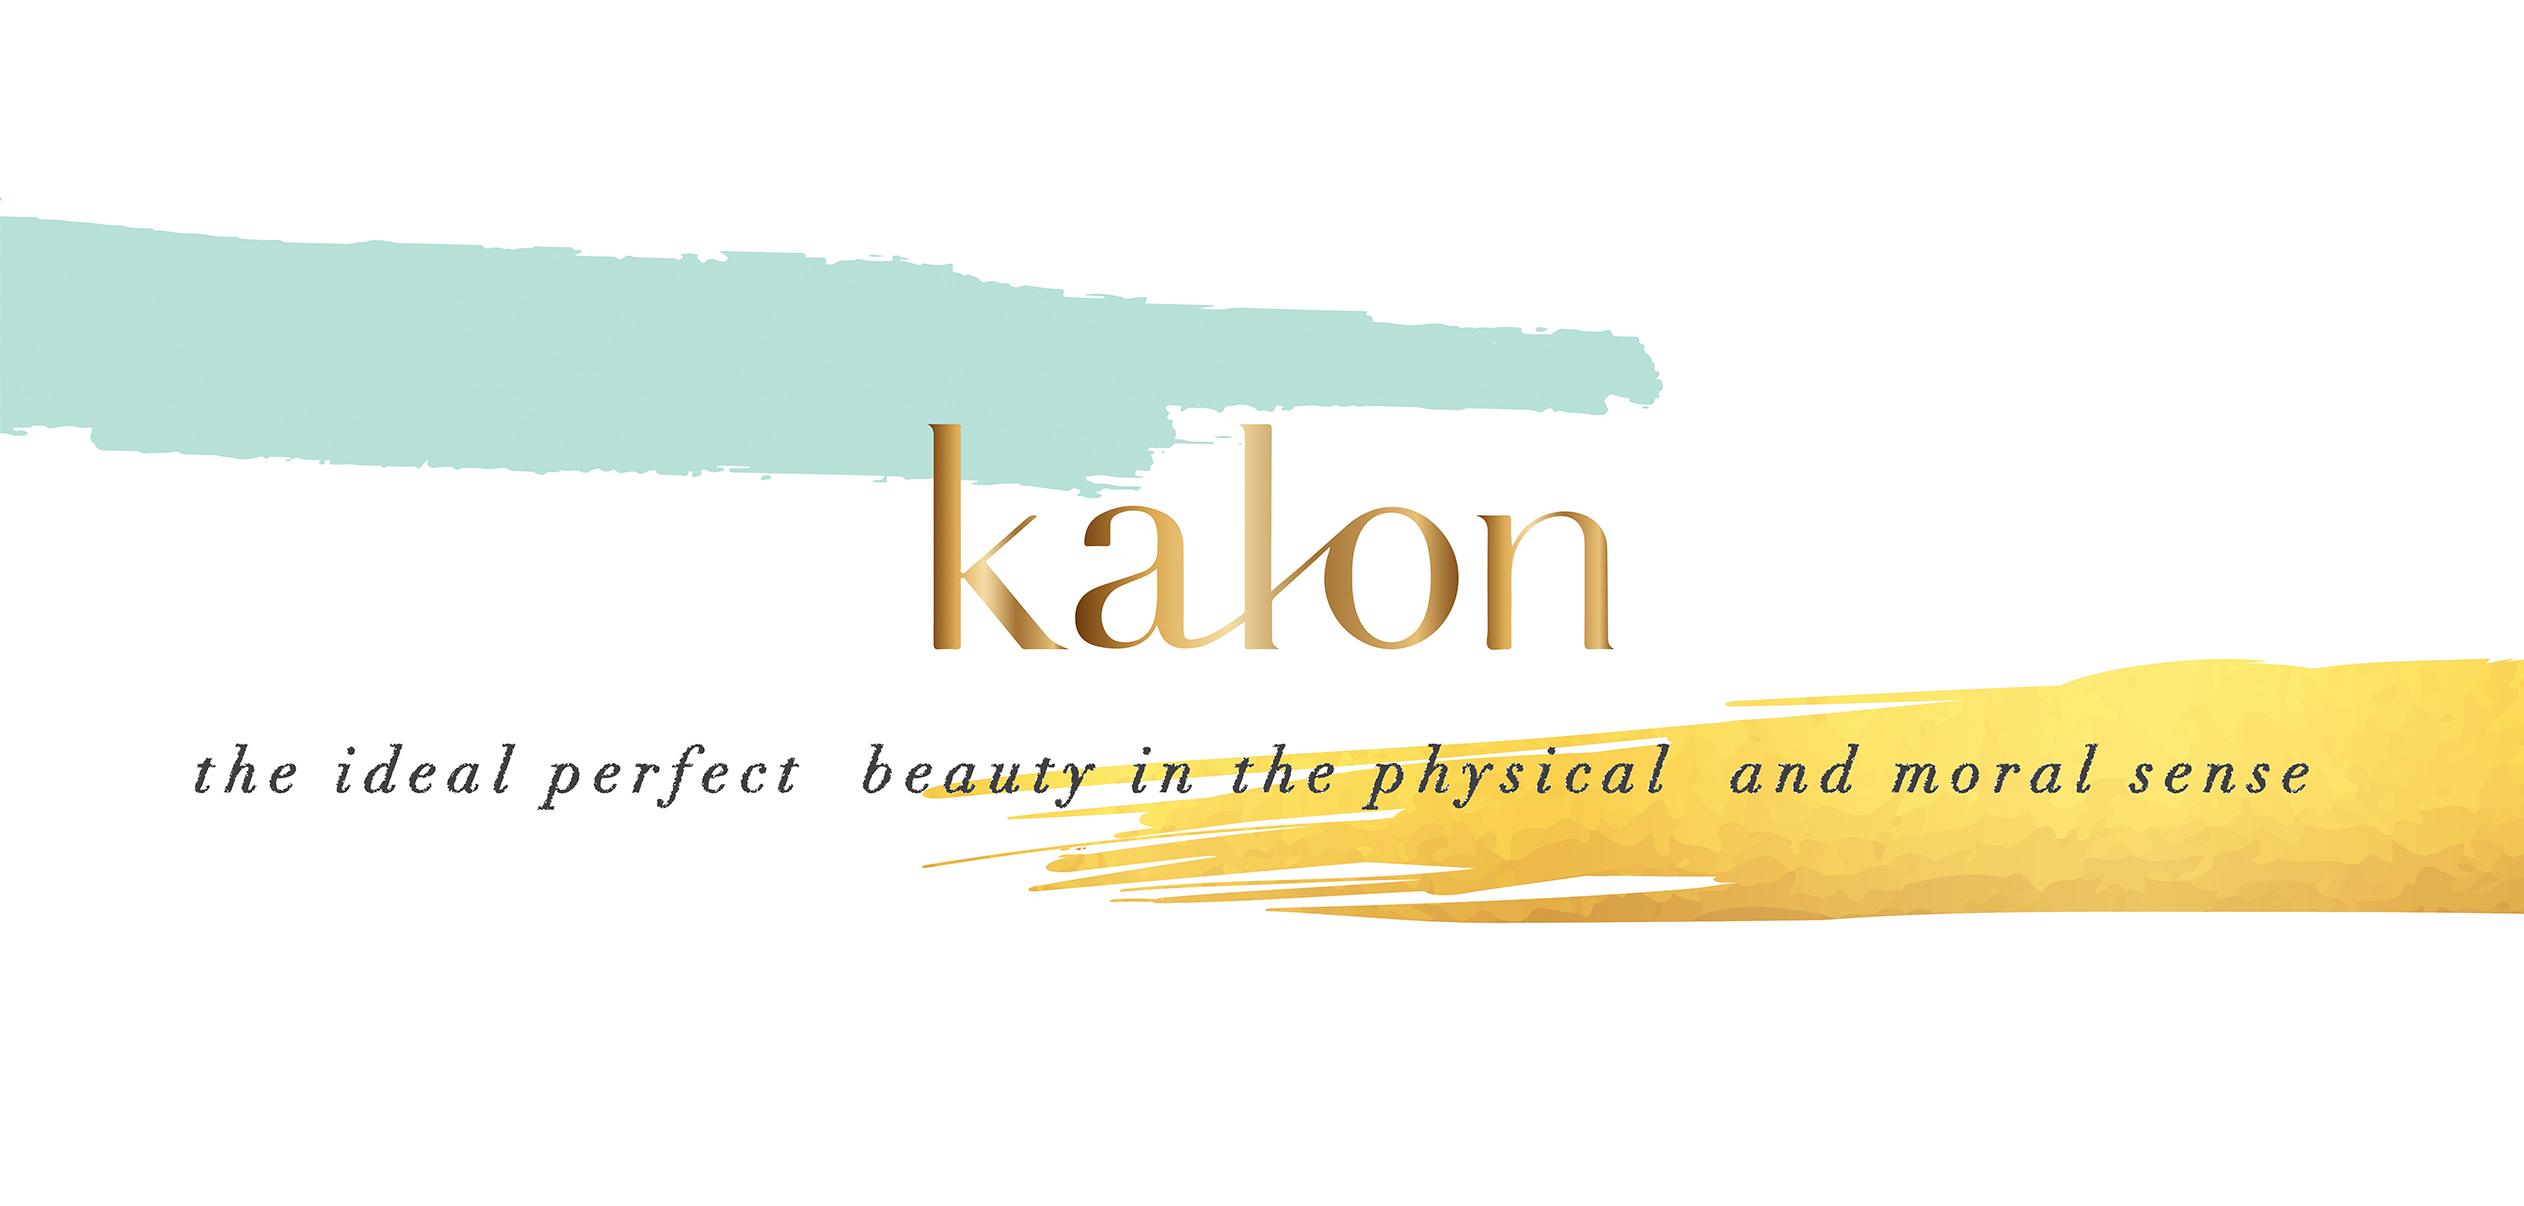 Kalon Couture (HK)